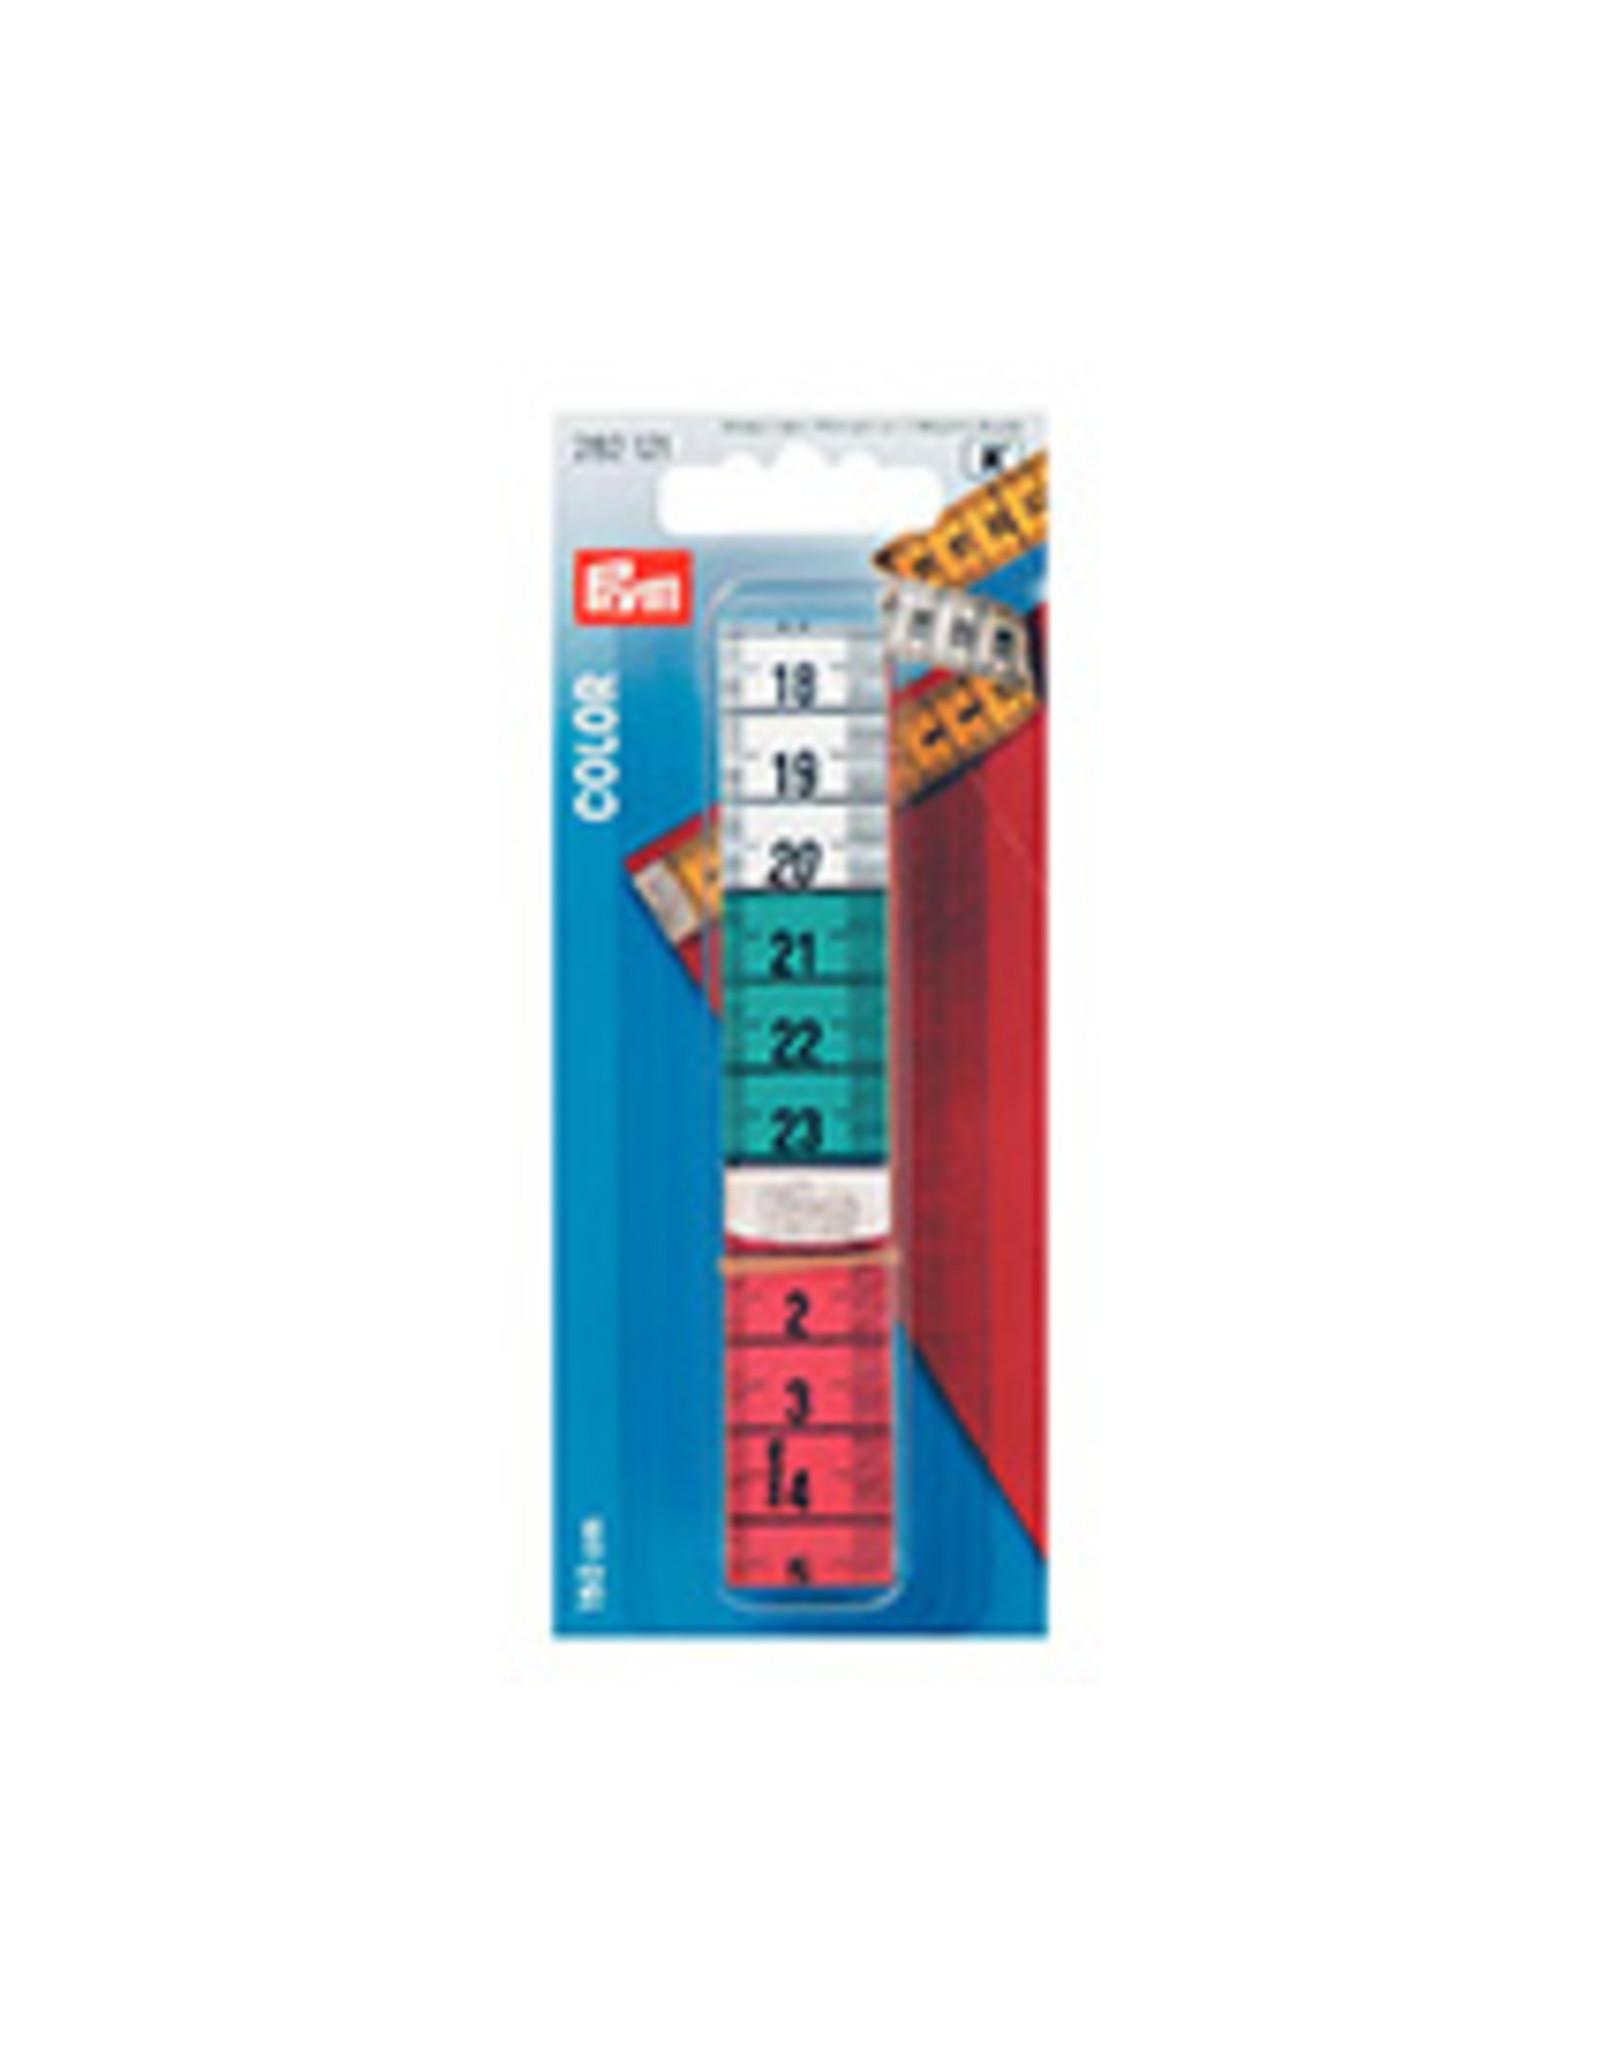 Prym Prym - lintmeter 150cm color - 282 121